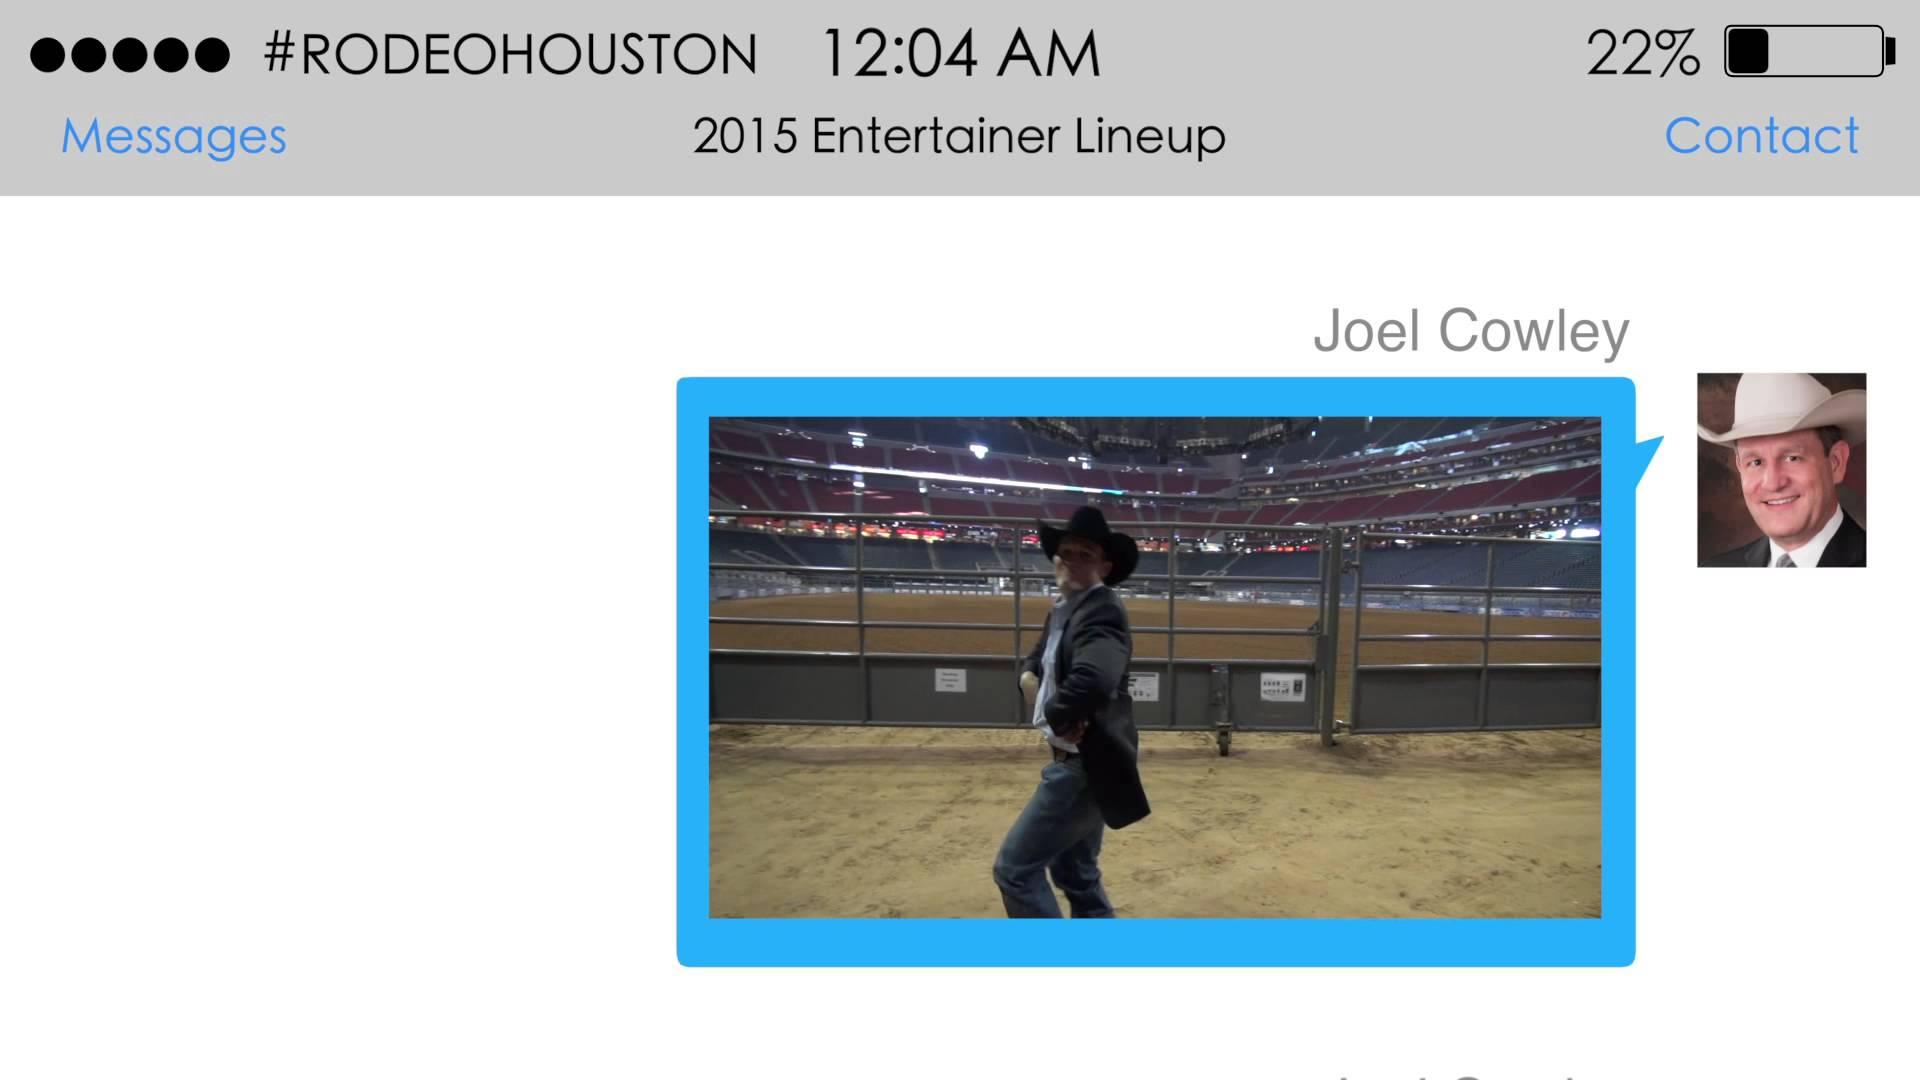 Houston Rodeo 2015 entertainment lineup announced